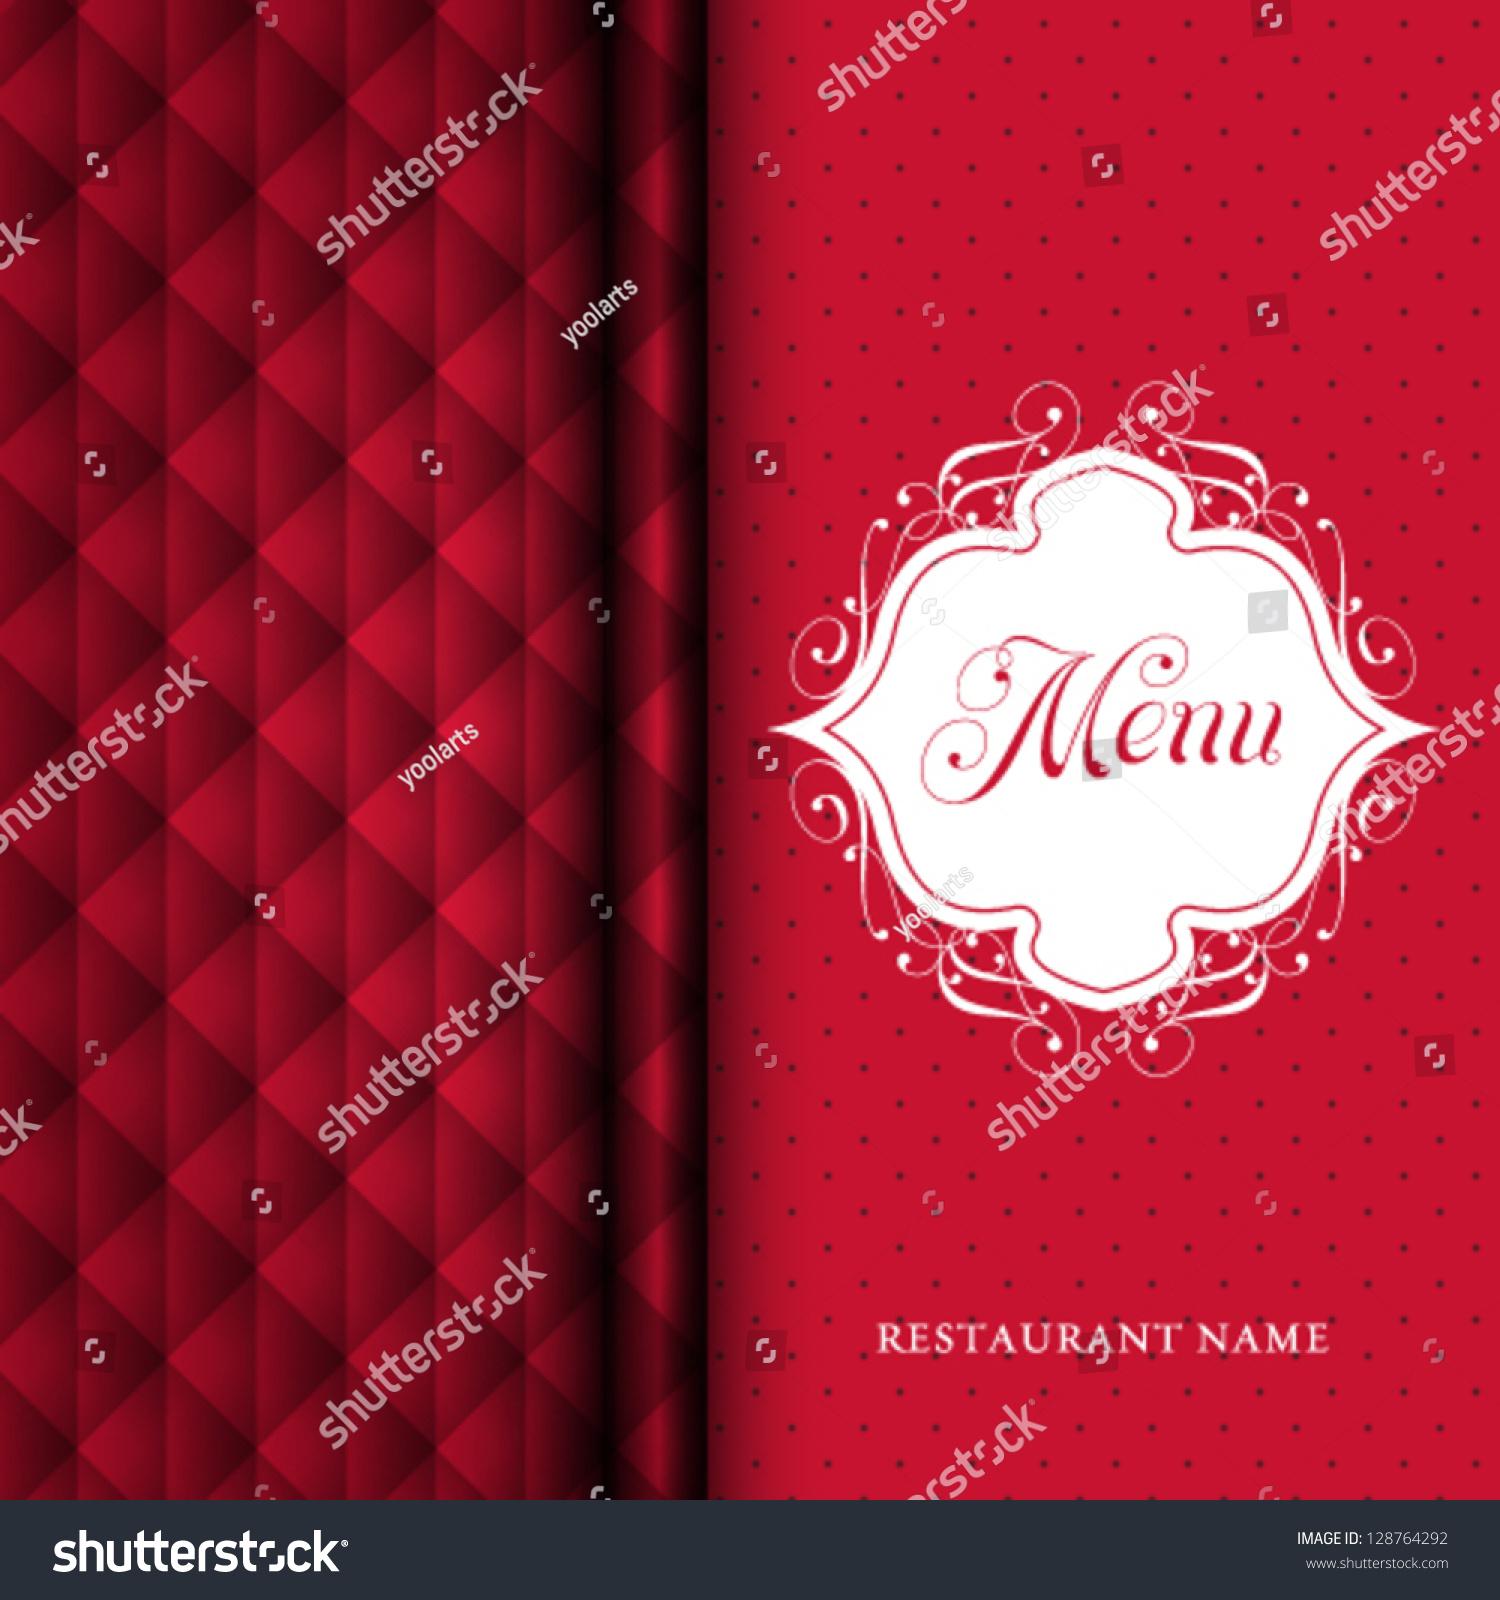 vector restaurant menu cover design stock vector 128764292